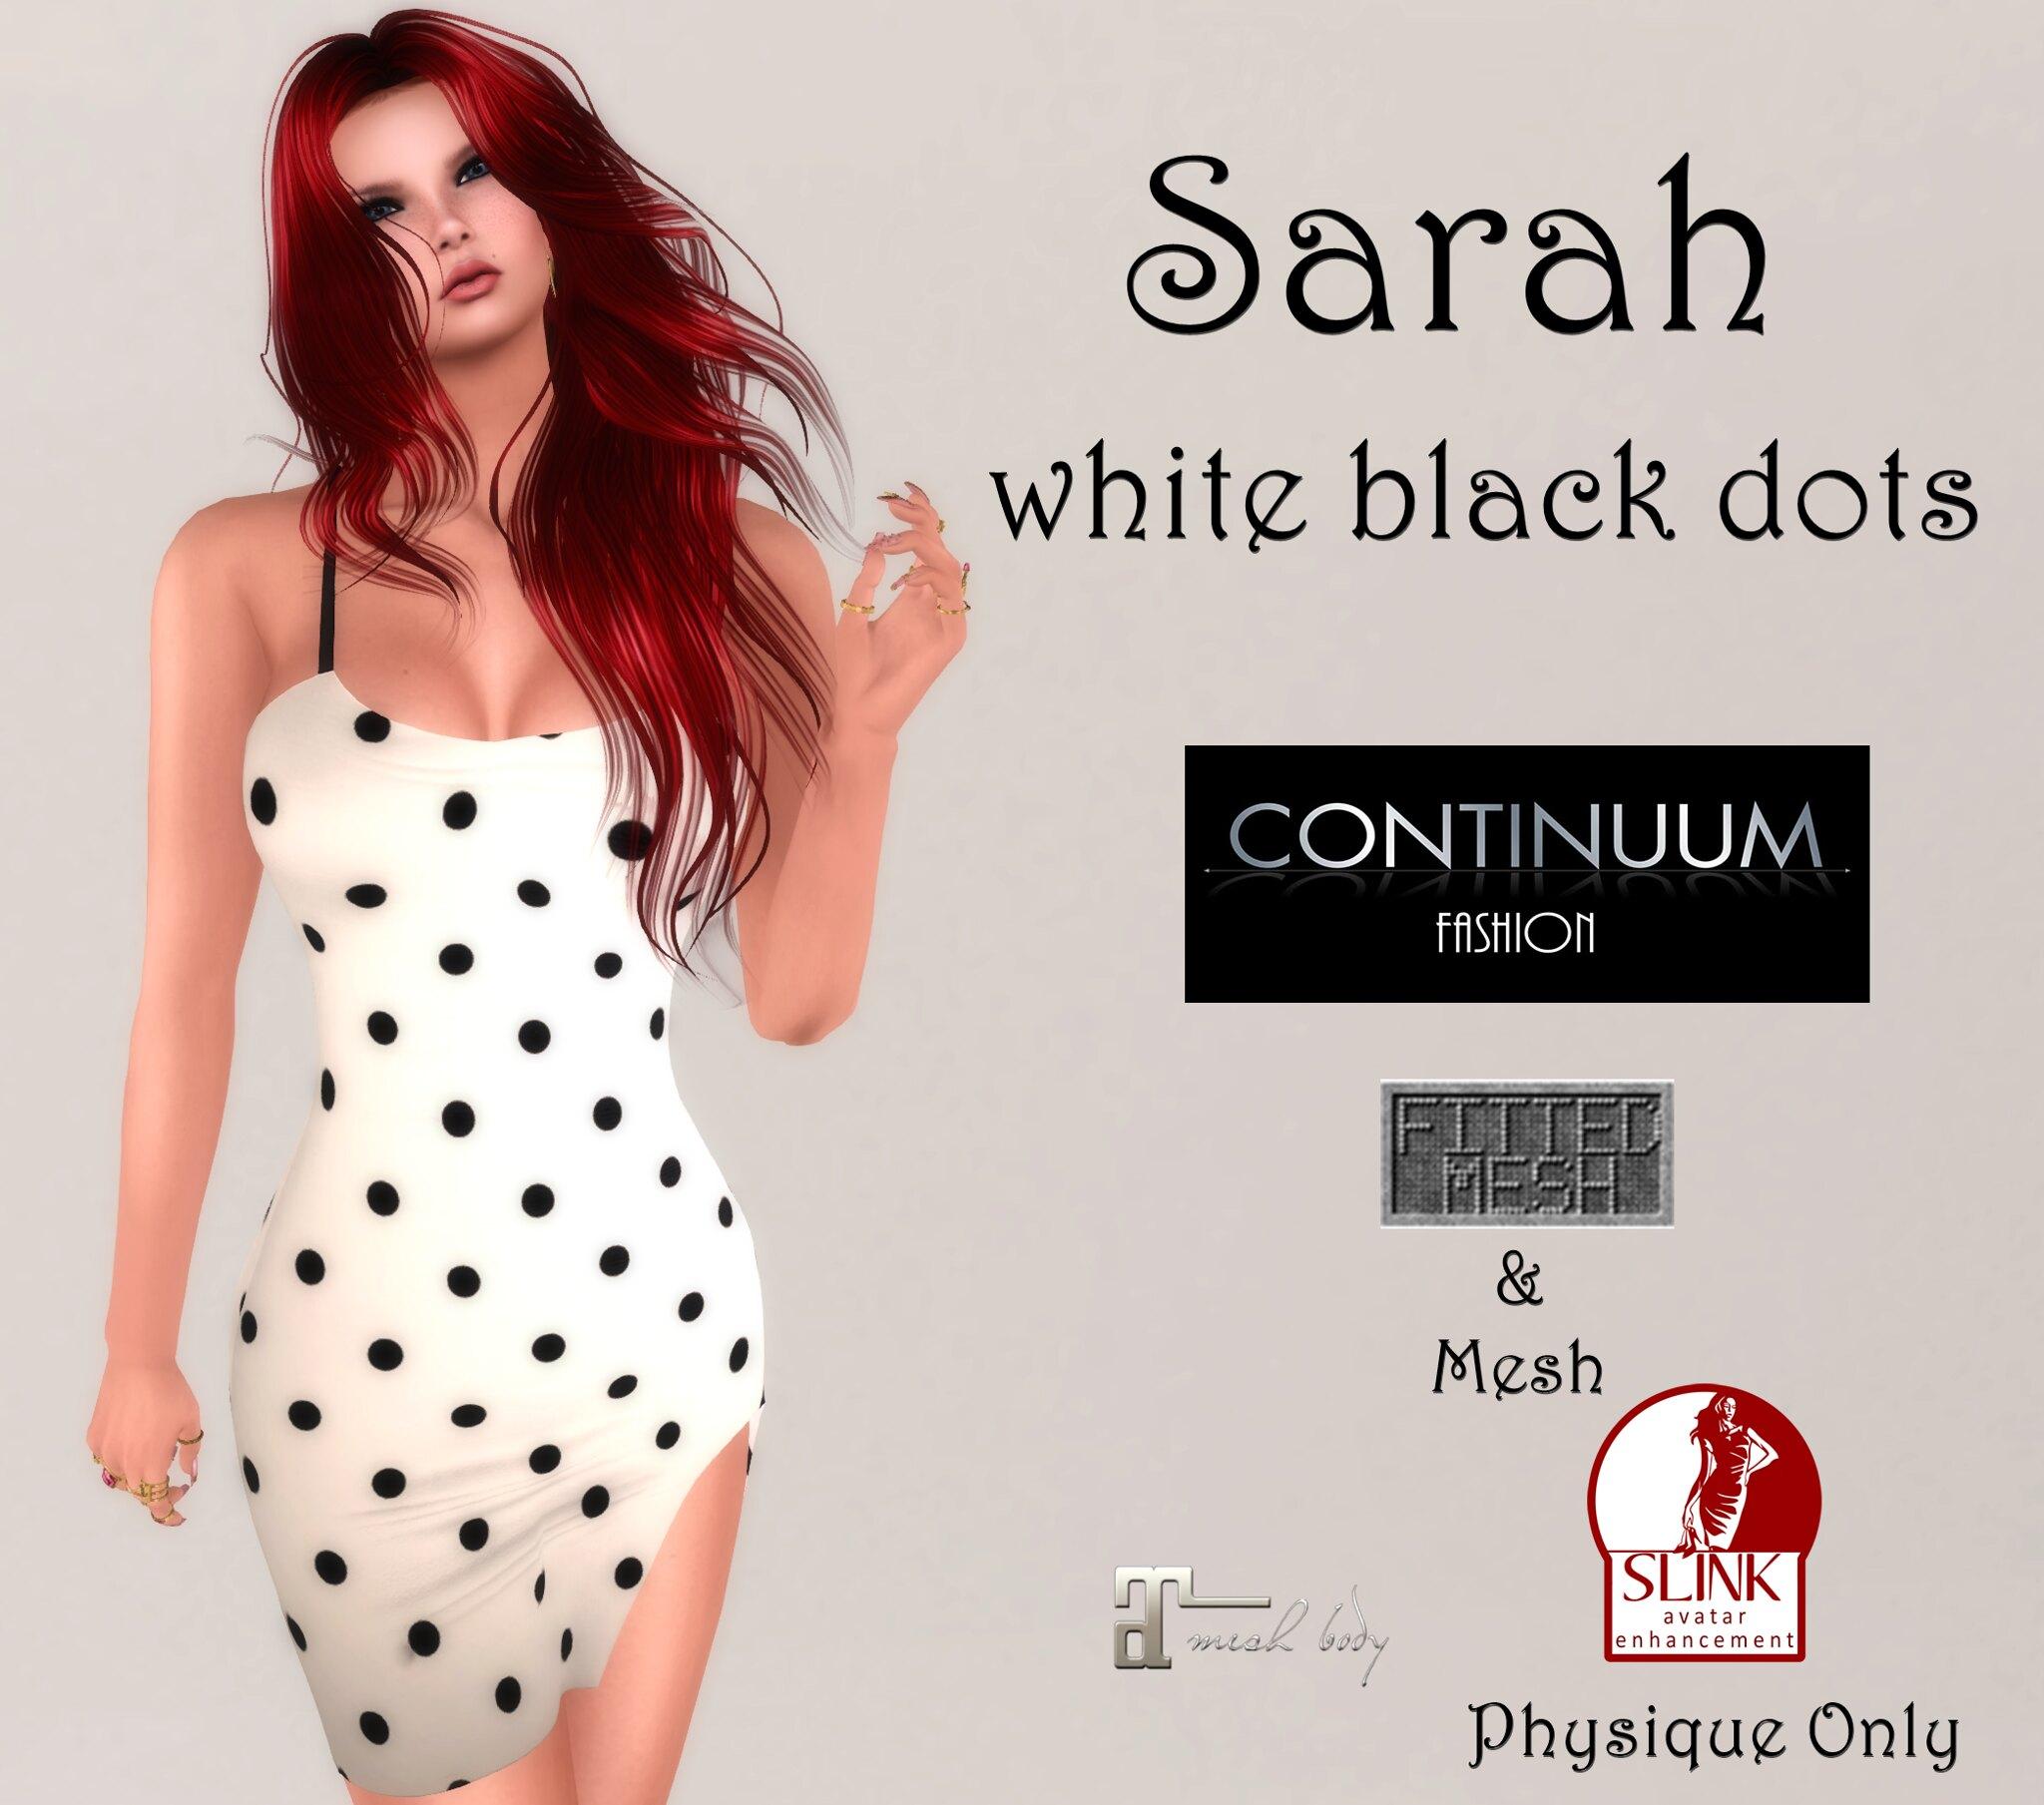 Continuum Sarah white black dots GIFT